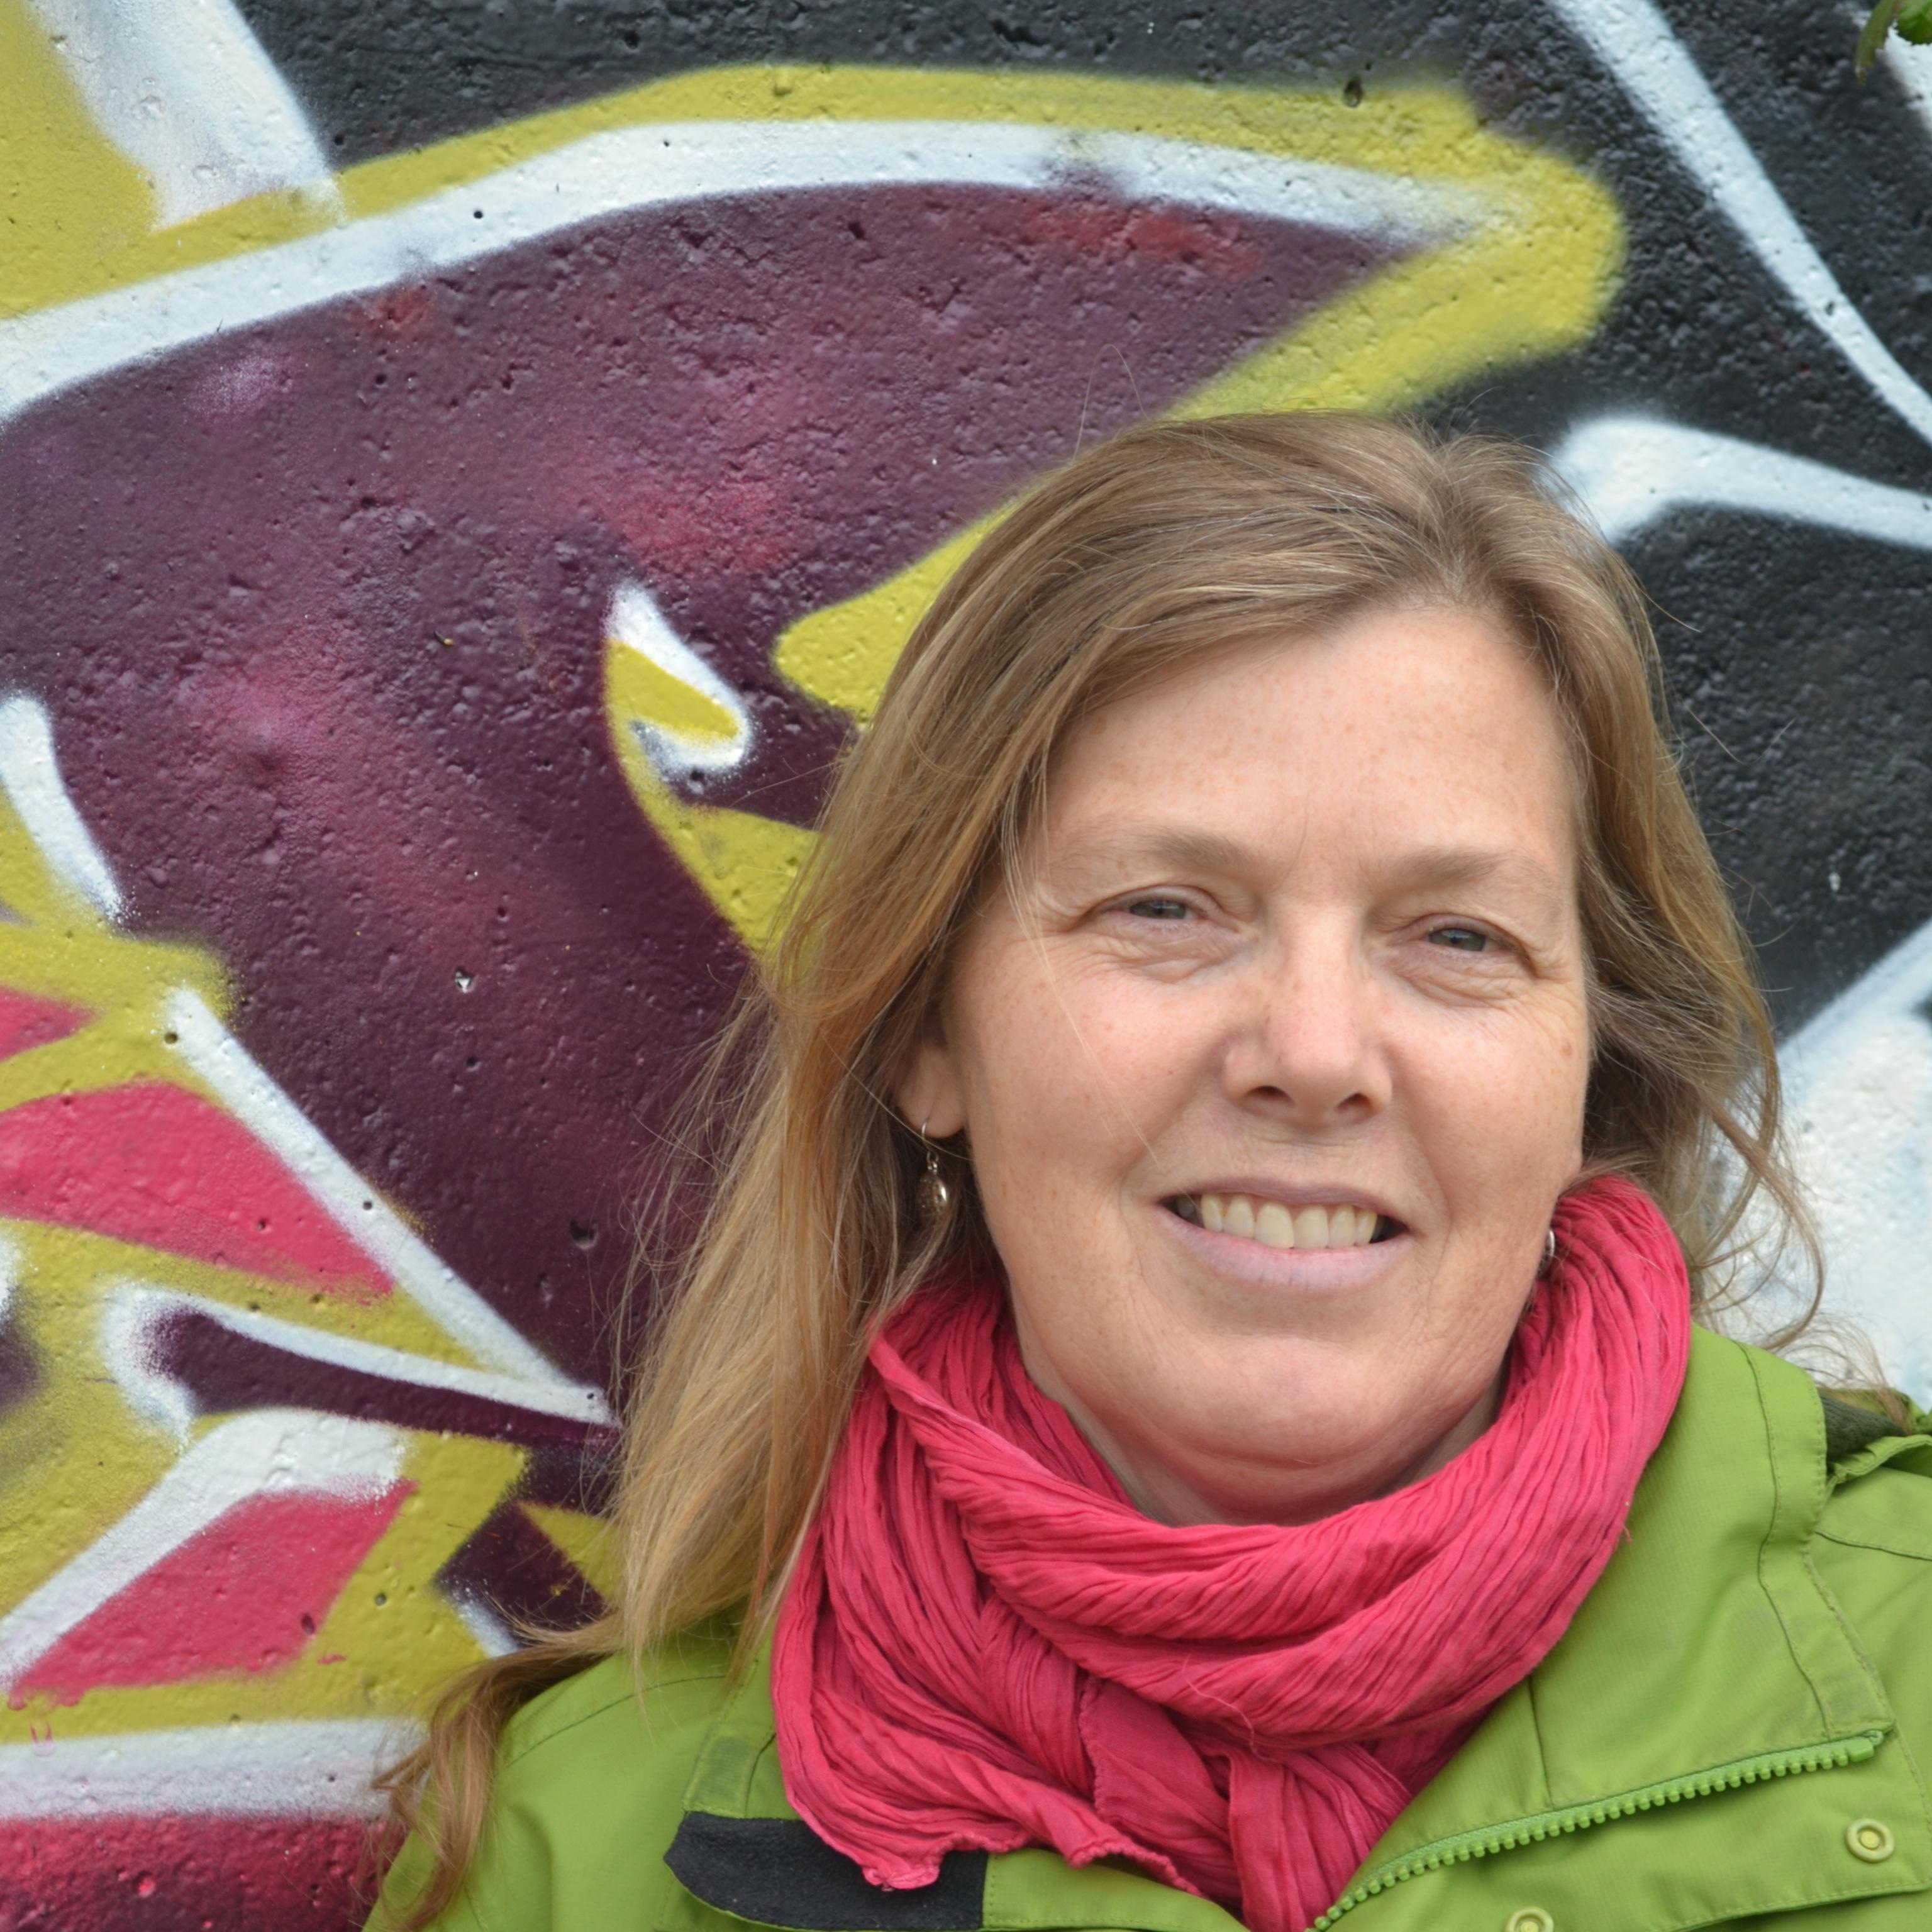 writer and editor Adrienne Mason